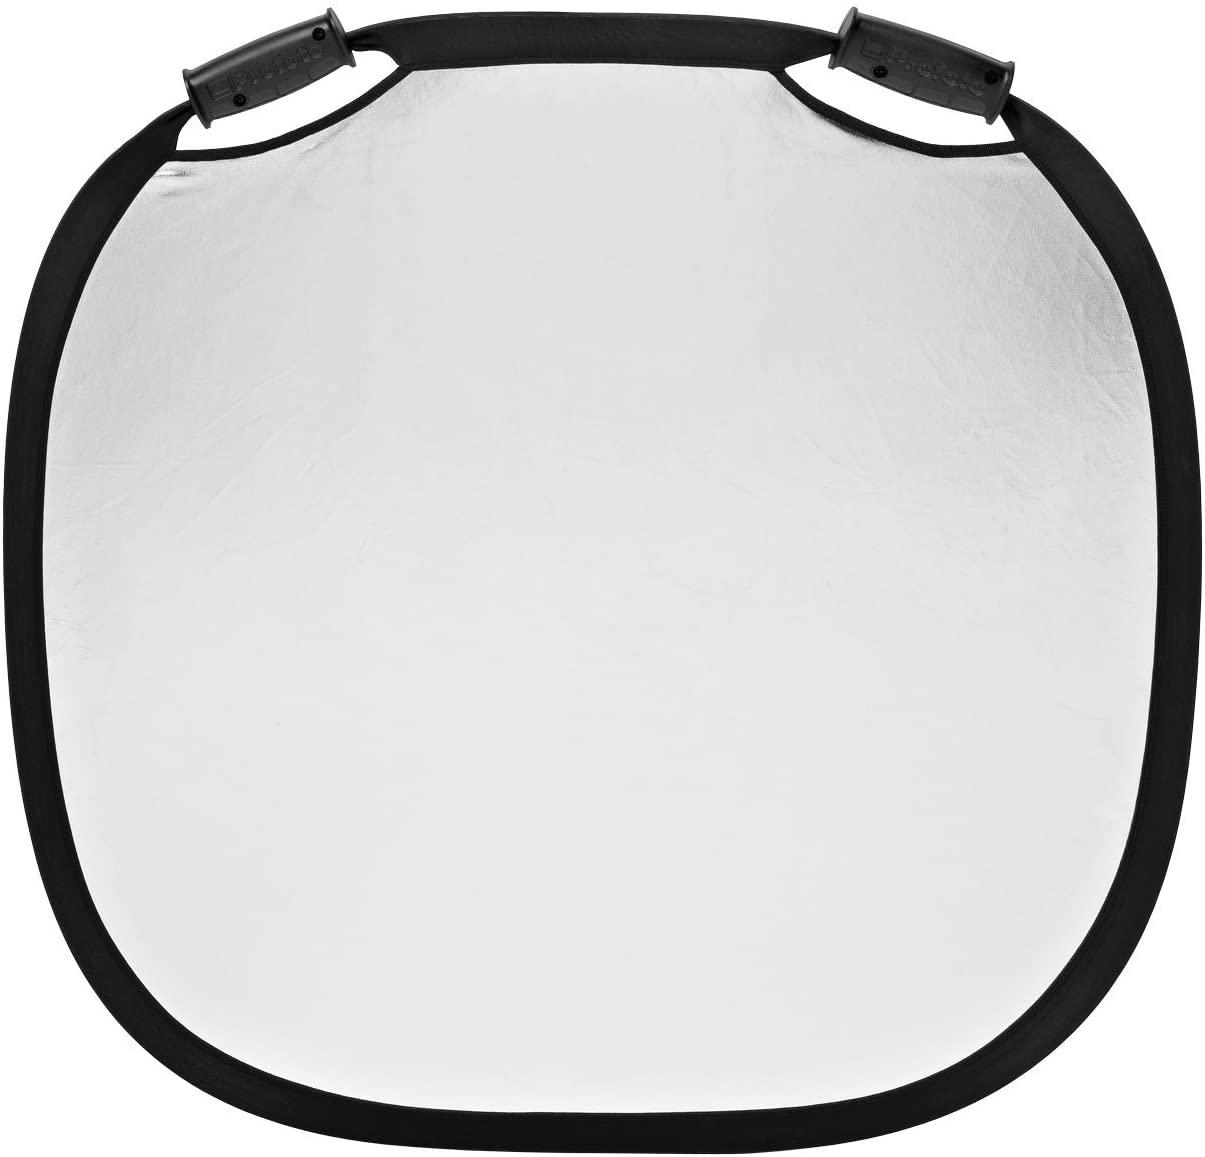 Profoto Medium Reflector - Silver/White